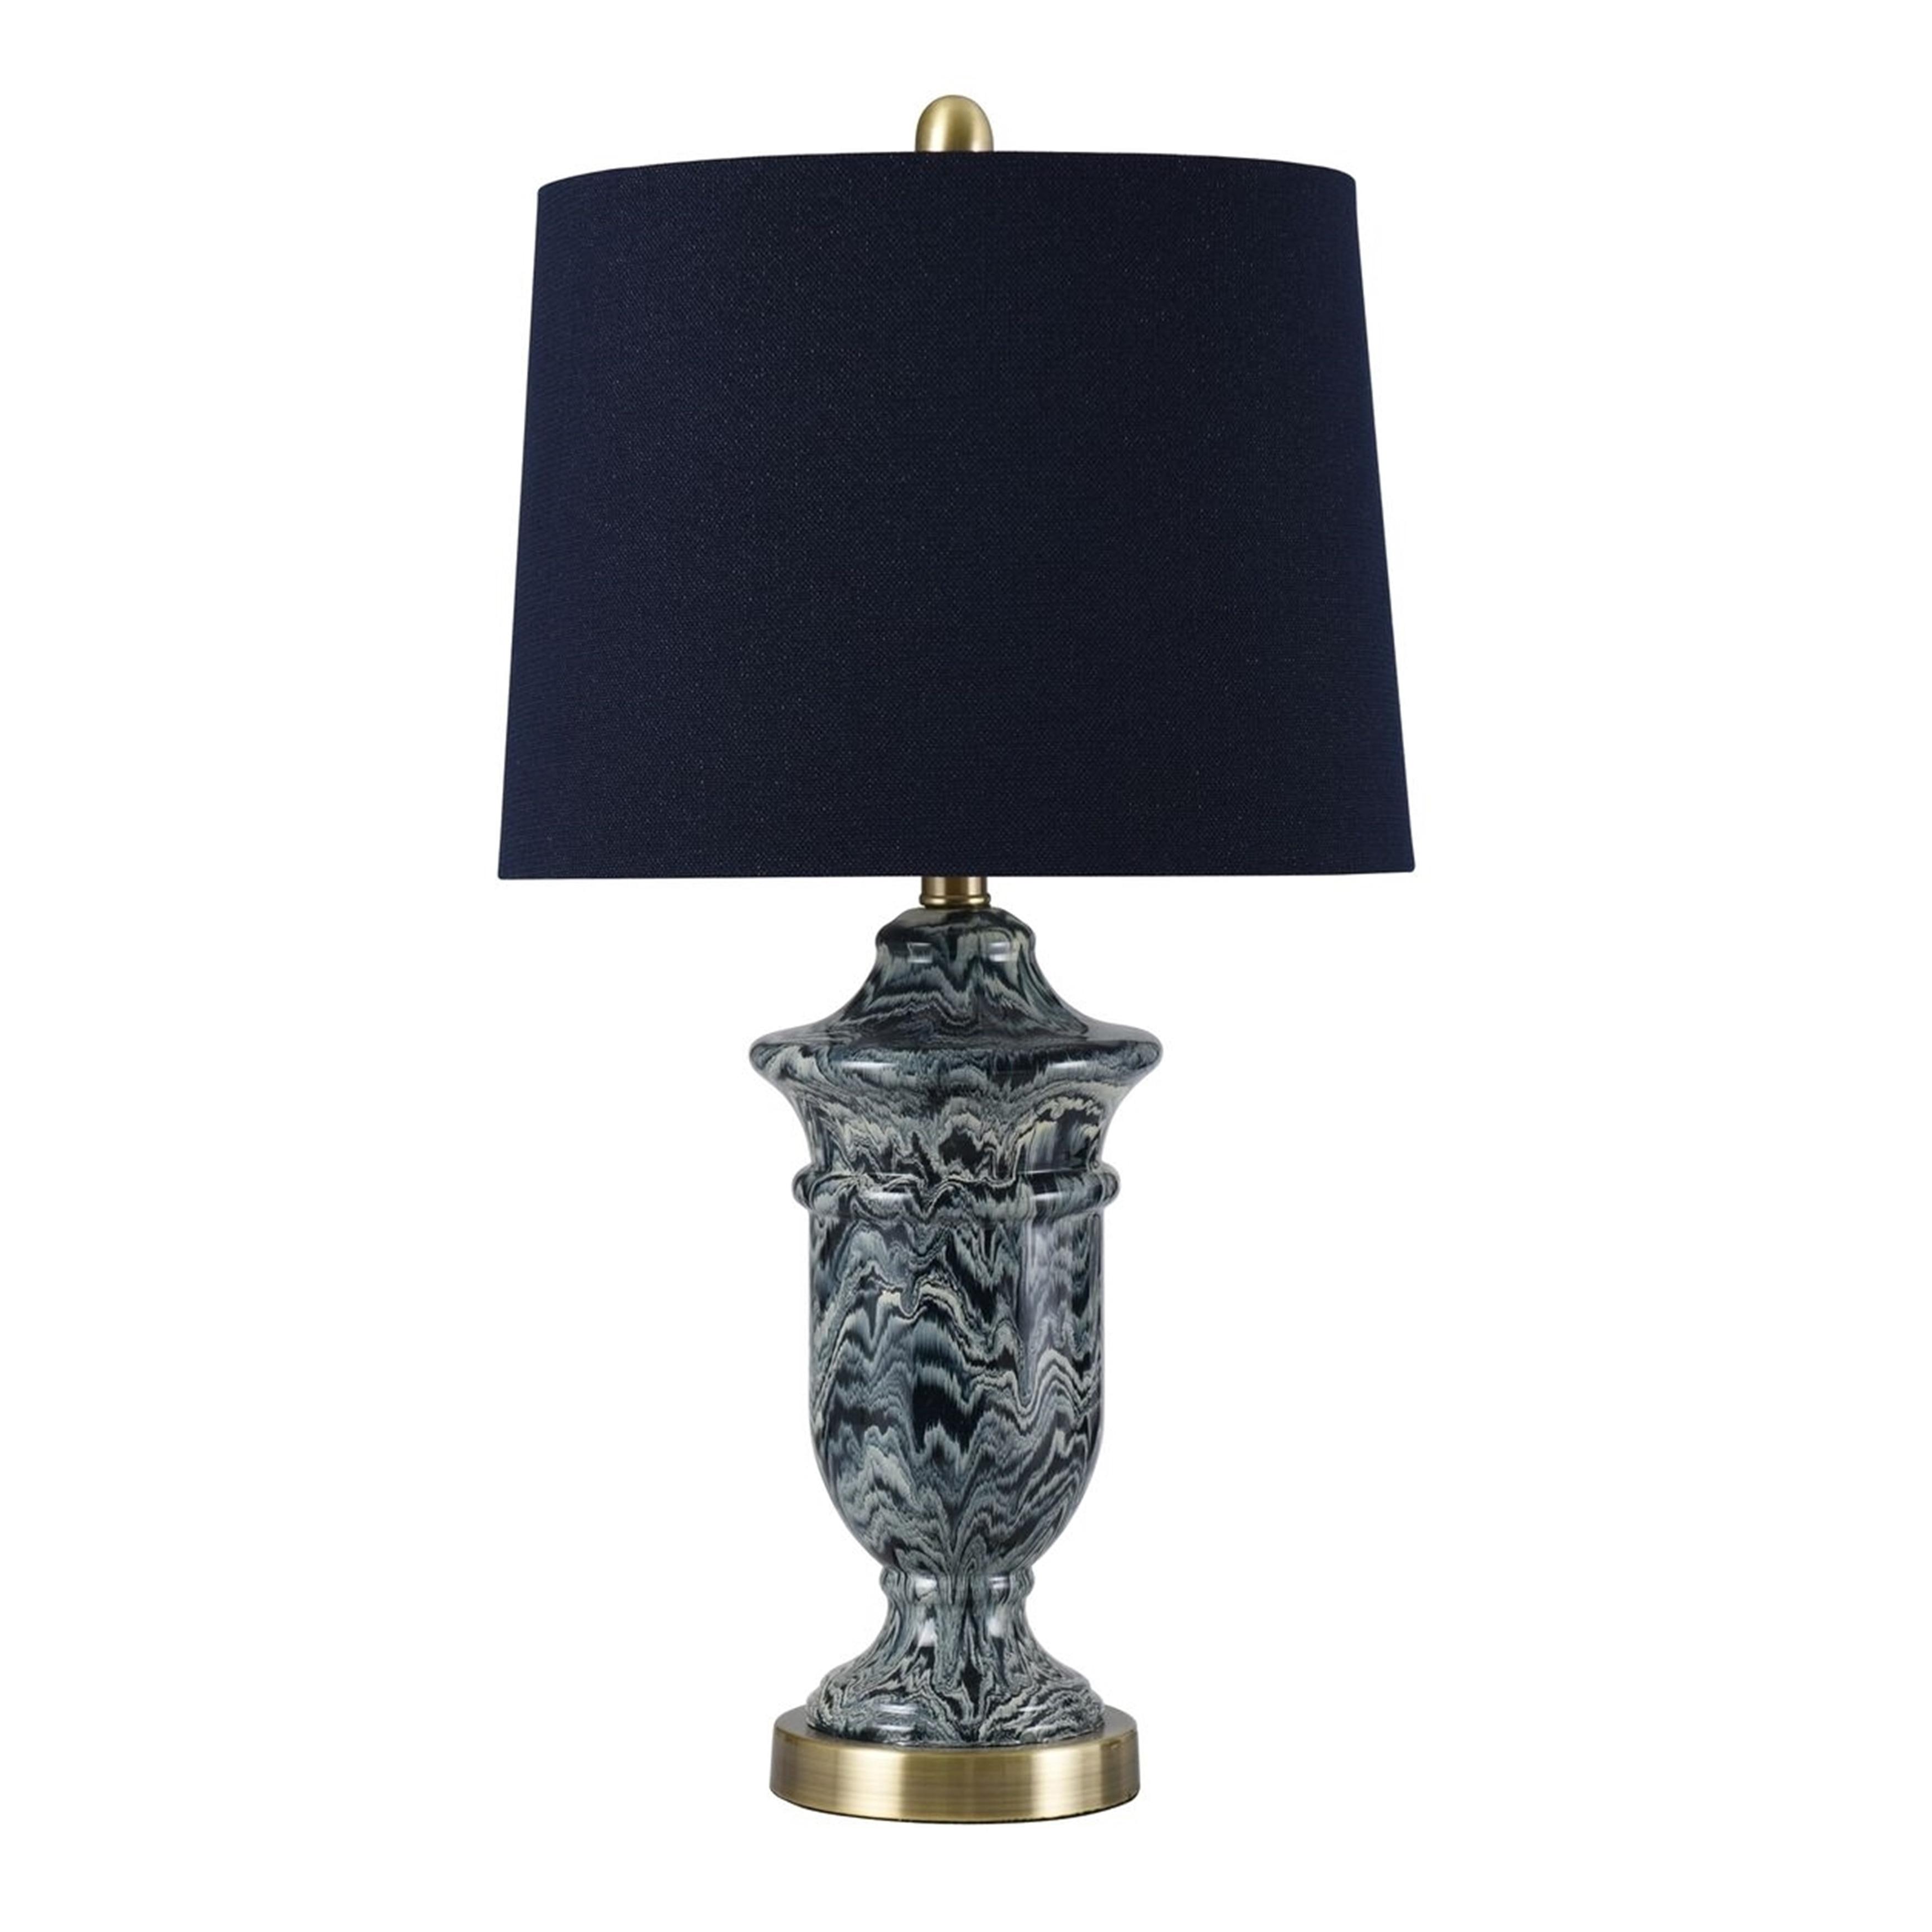 Kelley Navy Blue Blade Paint Drip Table Lamp Navy Blue Shade